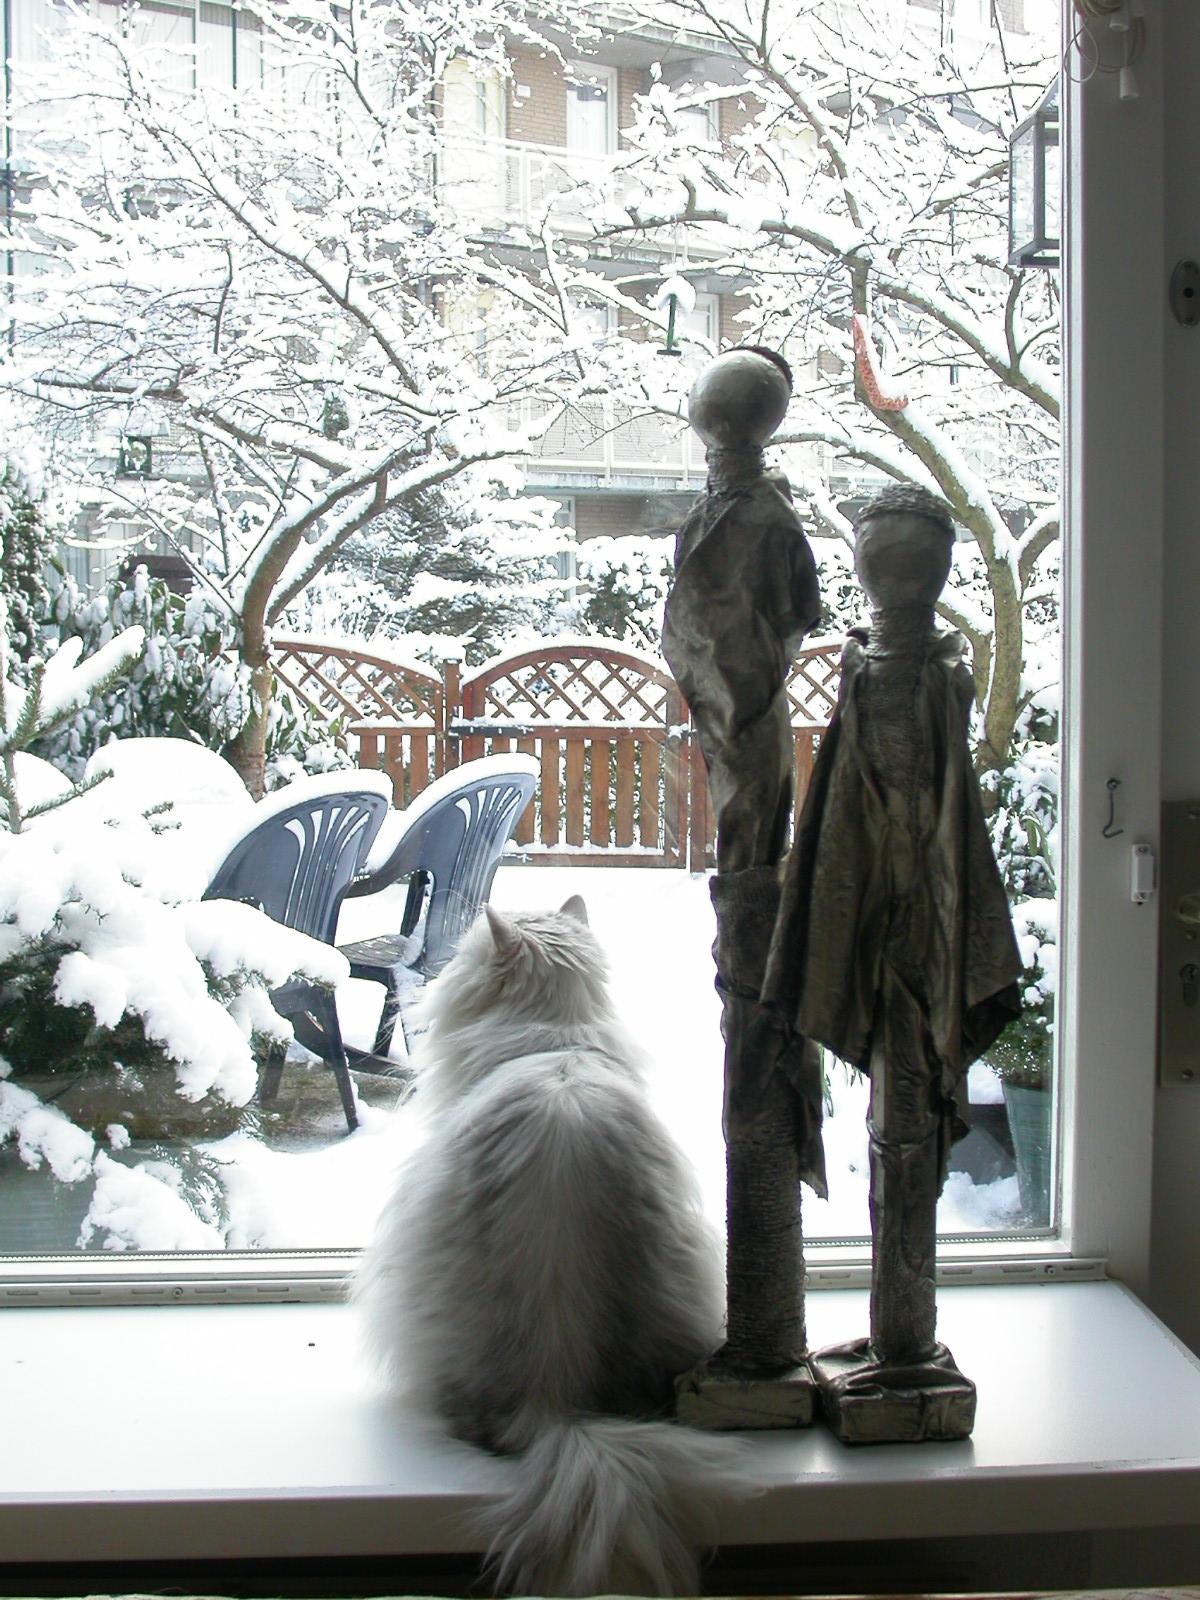 eva art sculptures winter cat staring out the window animals land human figures